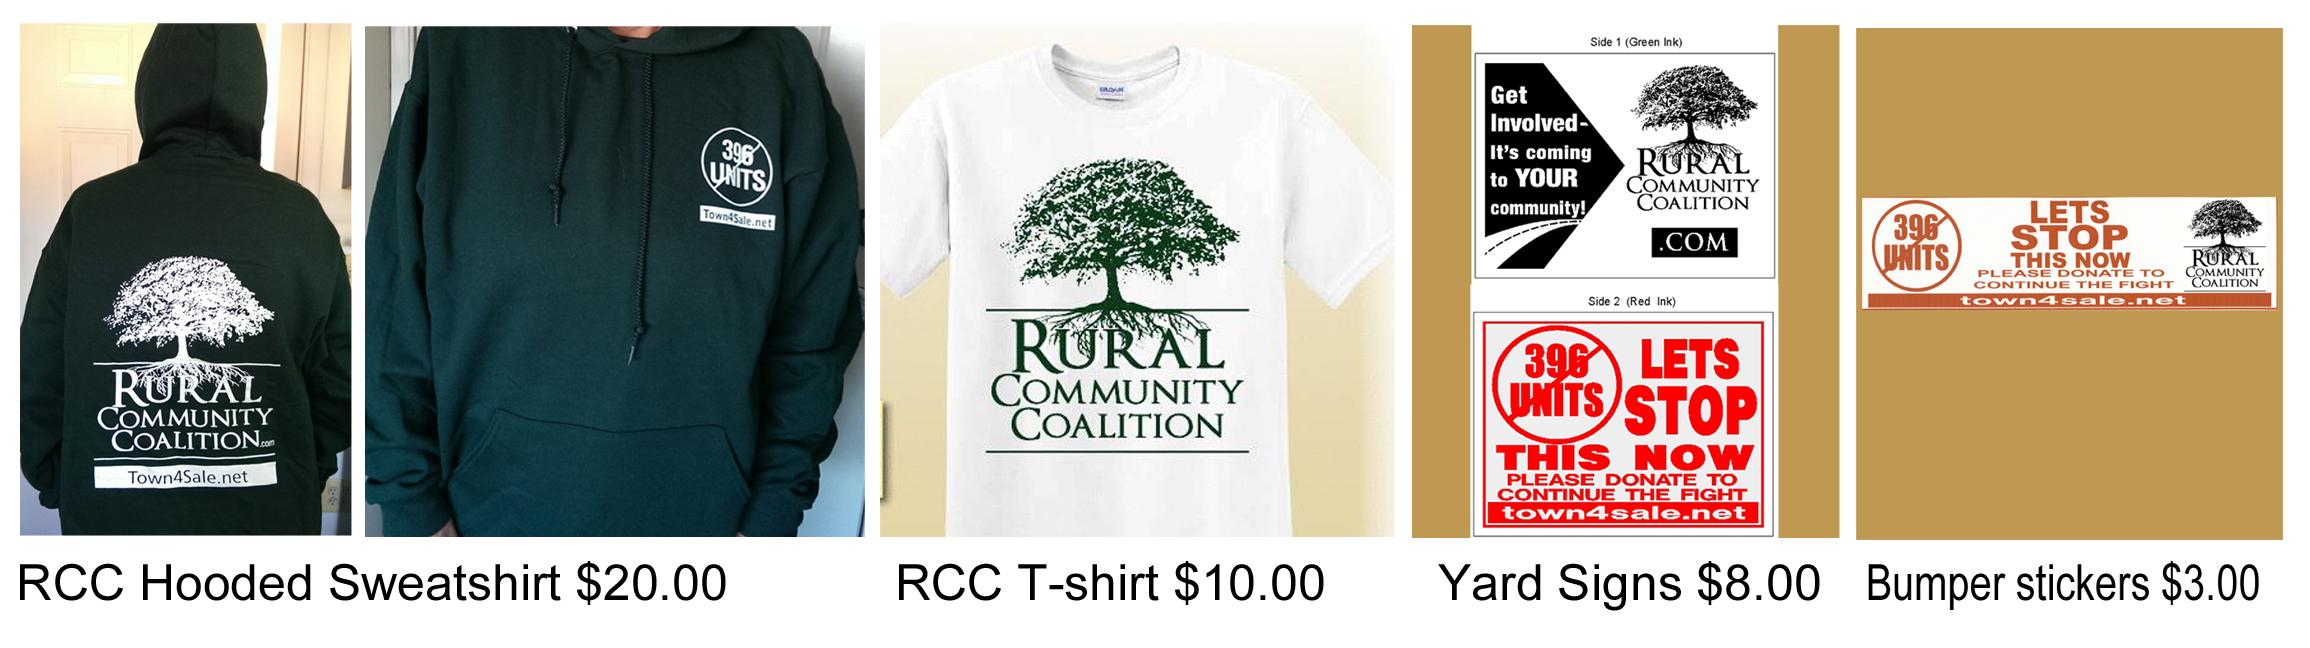 RCC SHOP .jpg